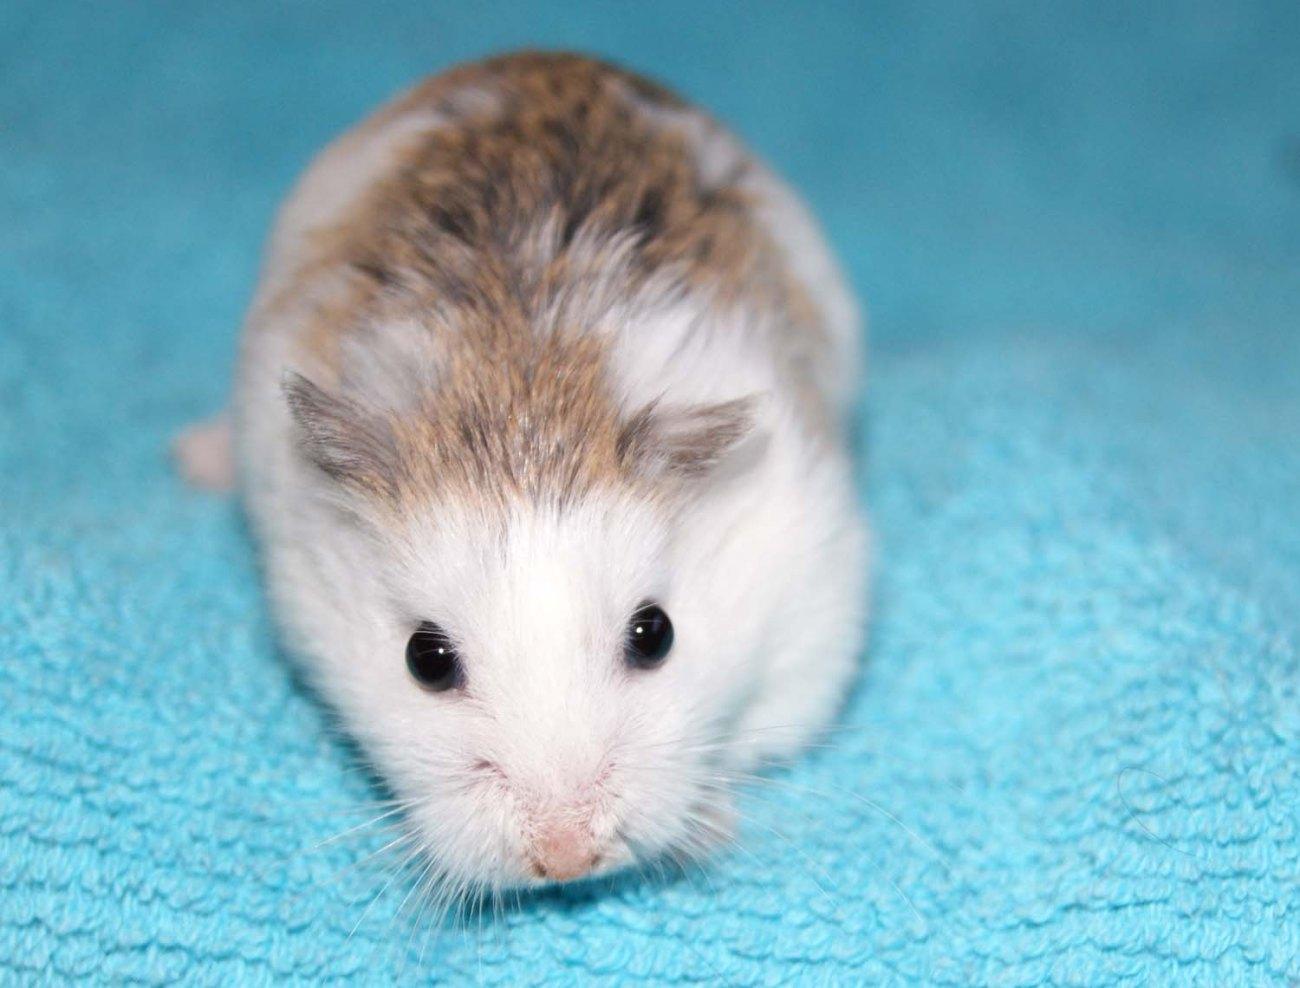 Hamster roborovski white face